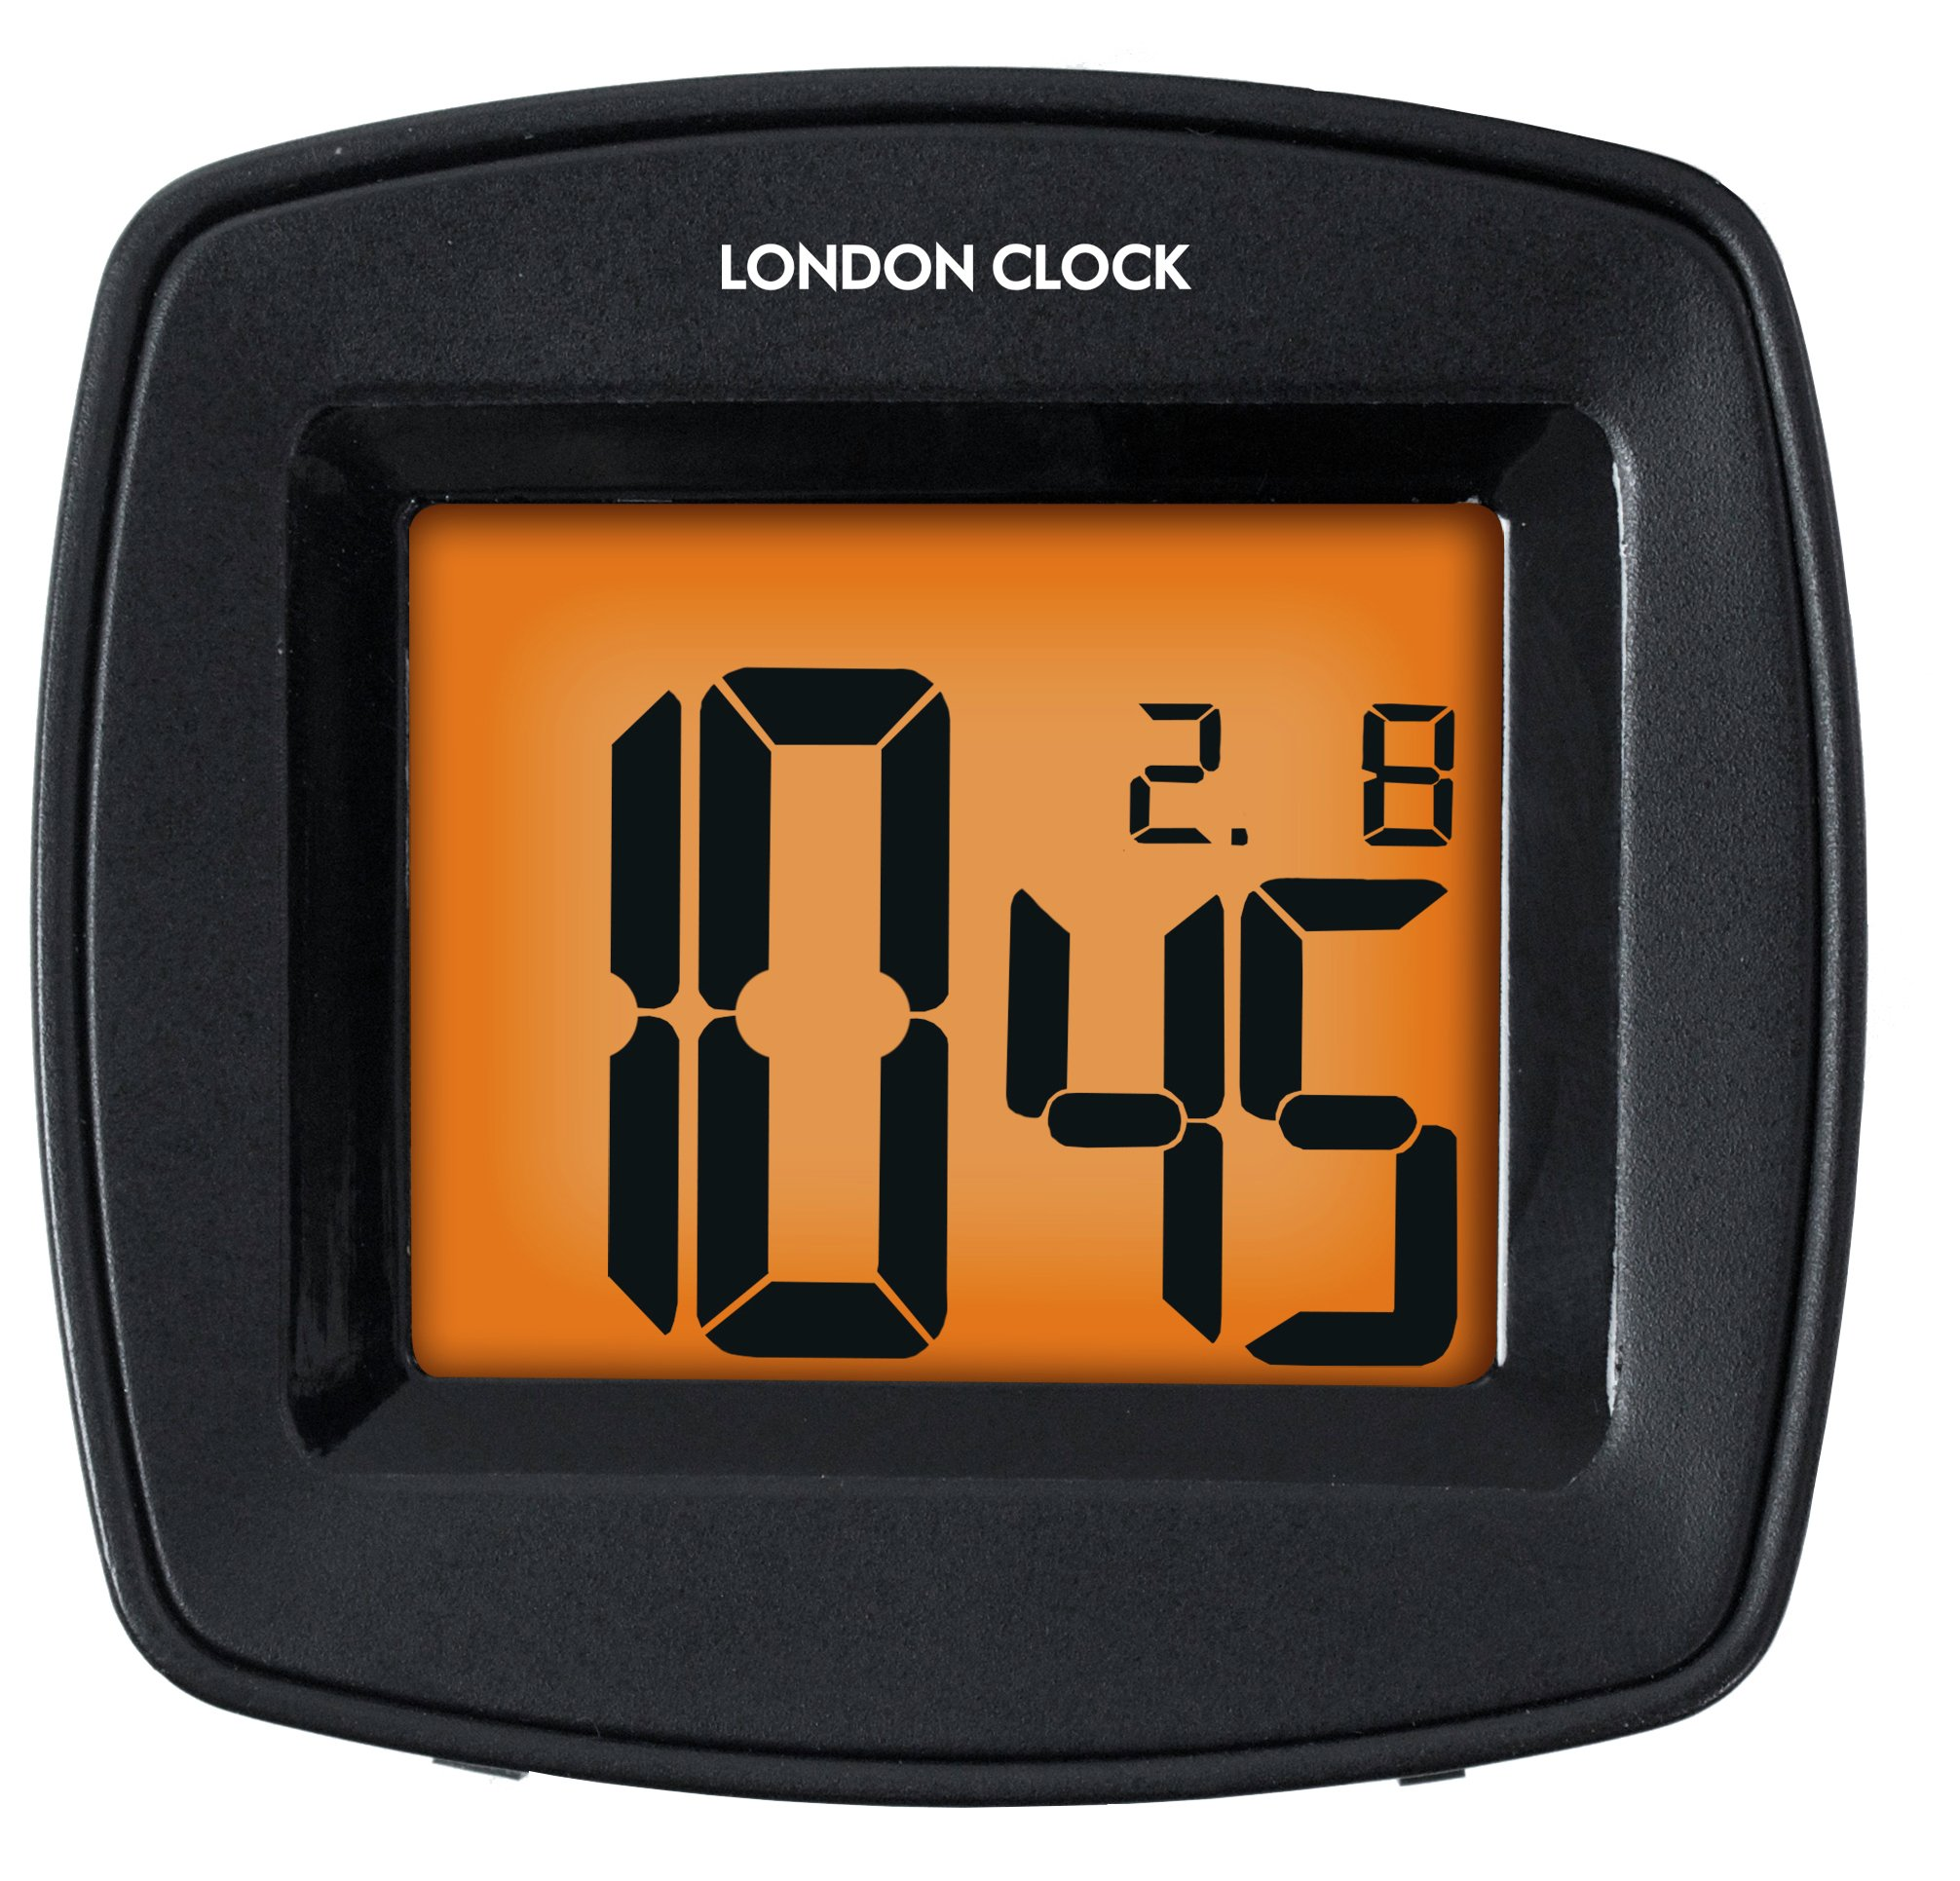 lc digital alarm clock gay times uk. Black Bedroom Furniture Sets. Home Design Ideas